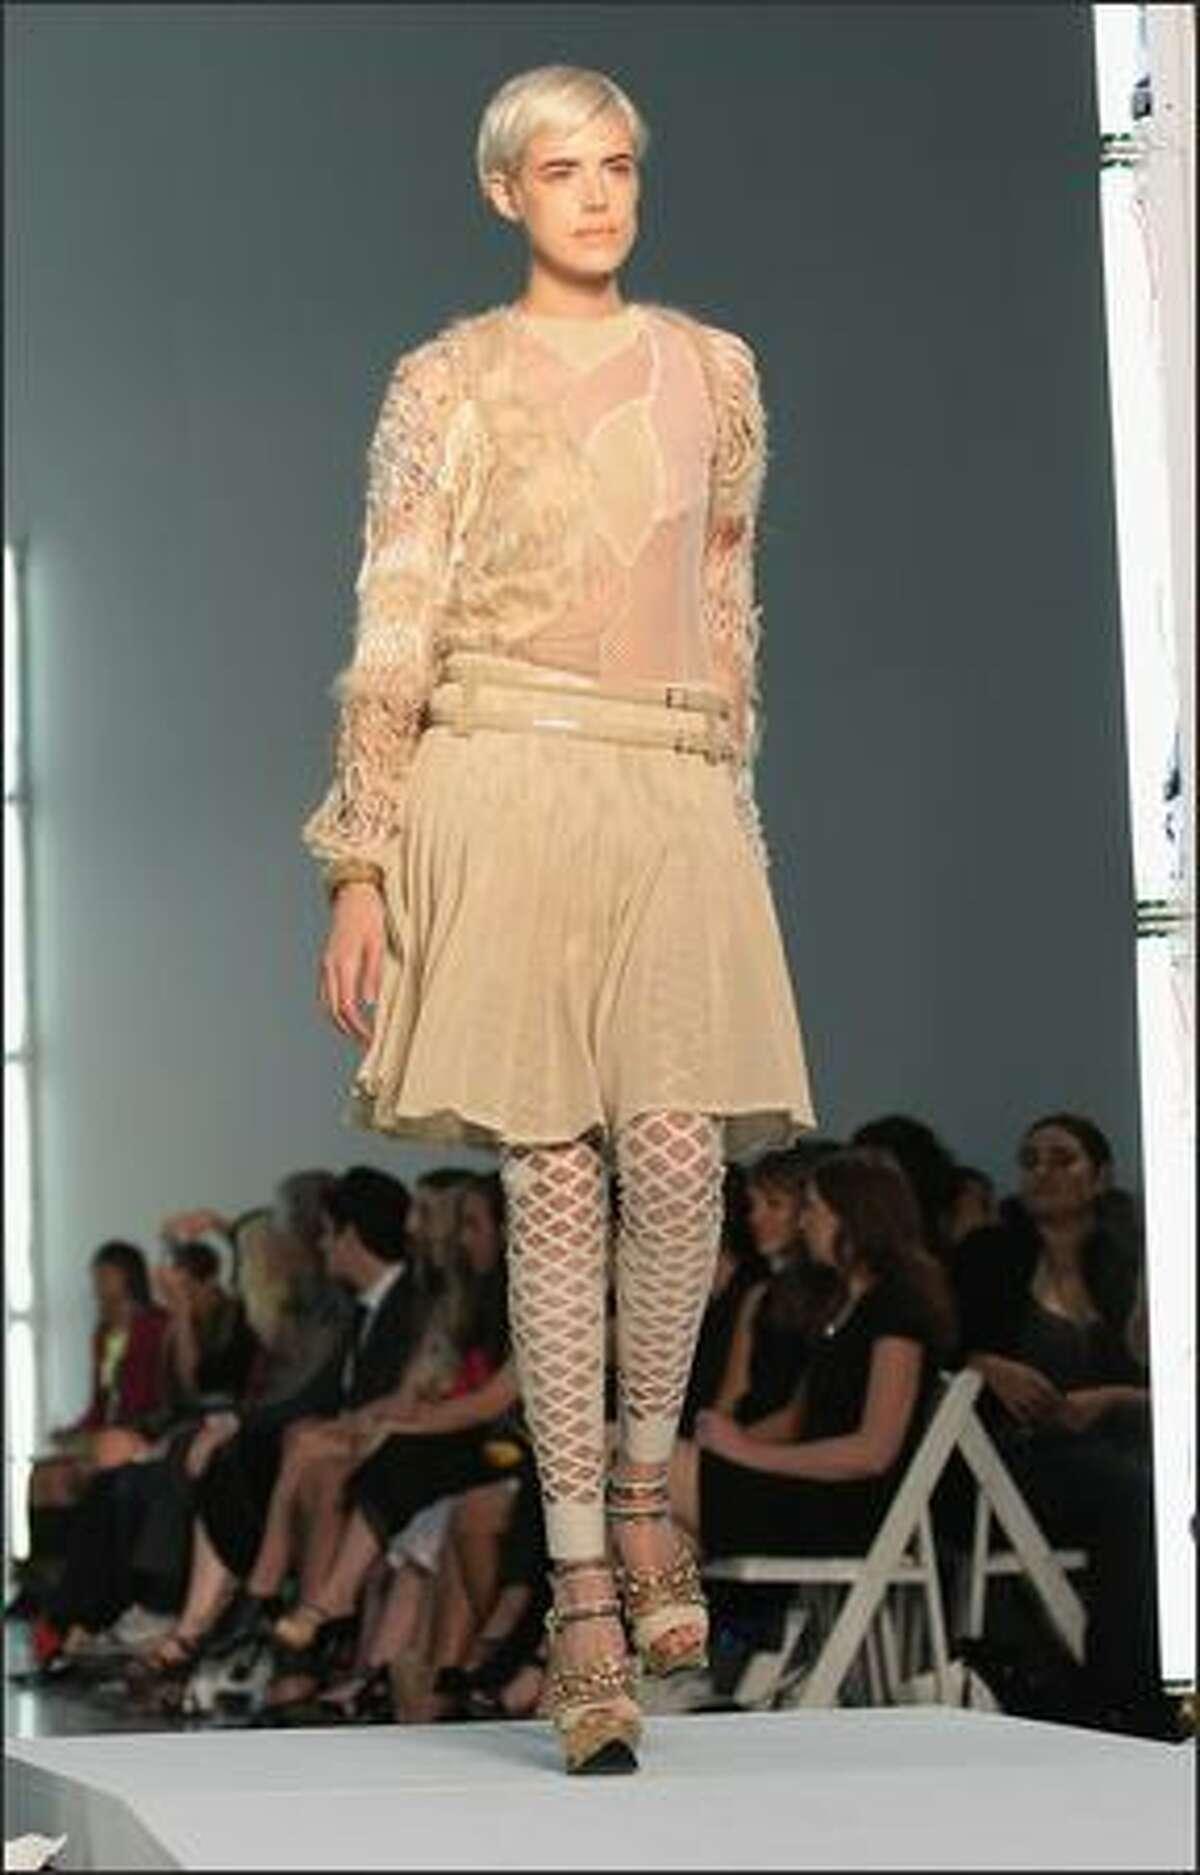 A model walks the runway at the Rodarte show.